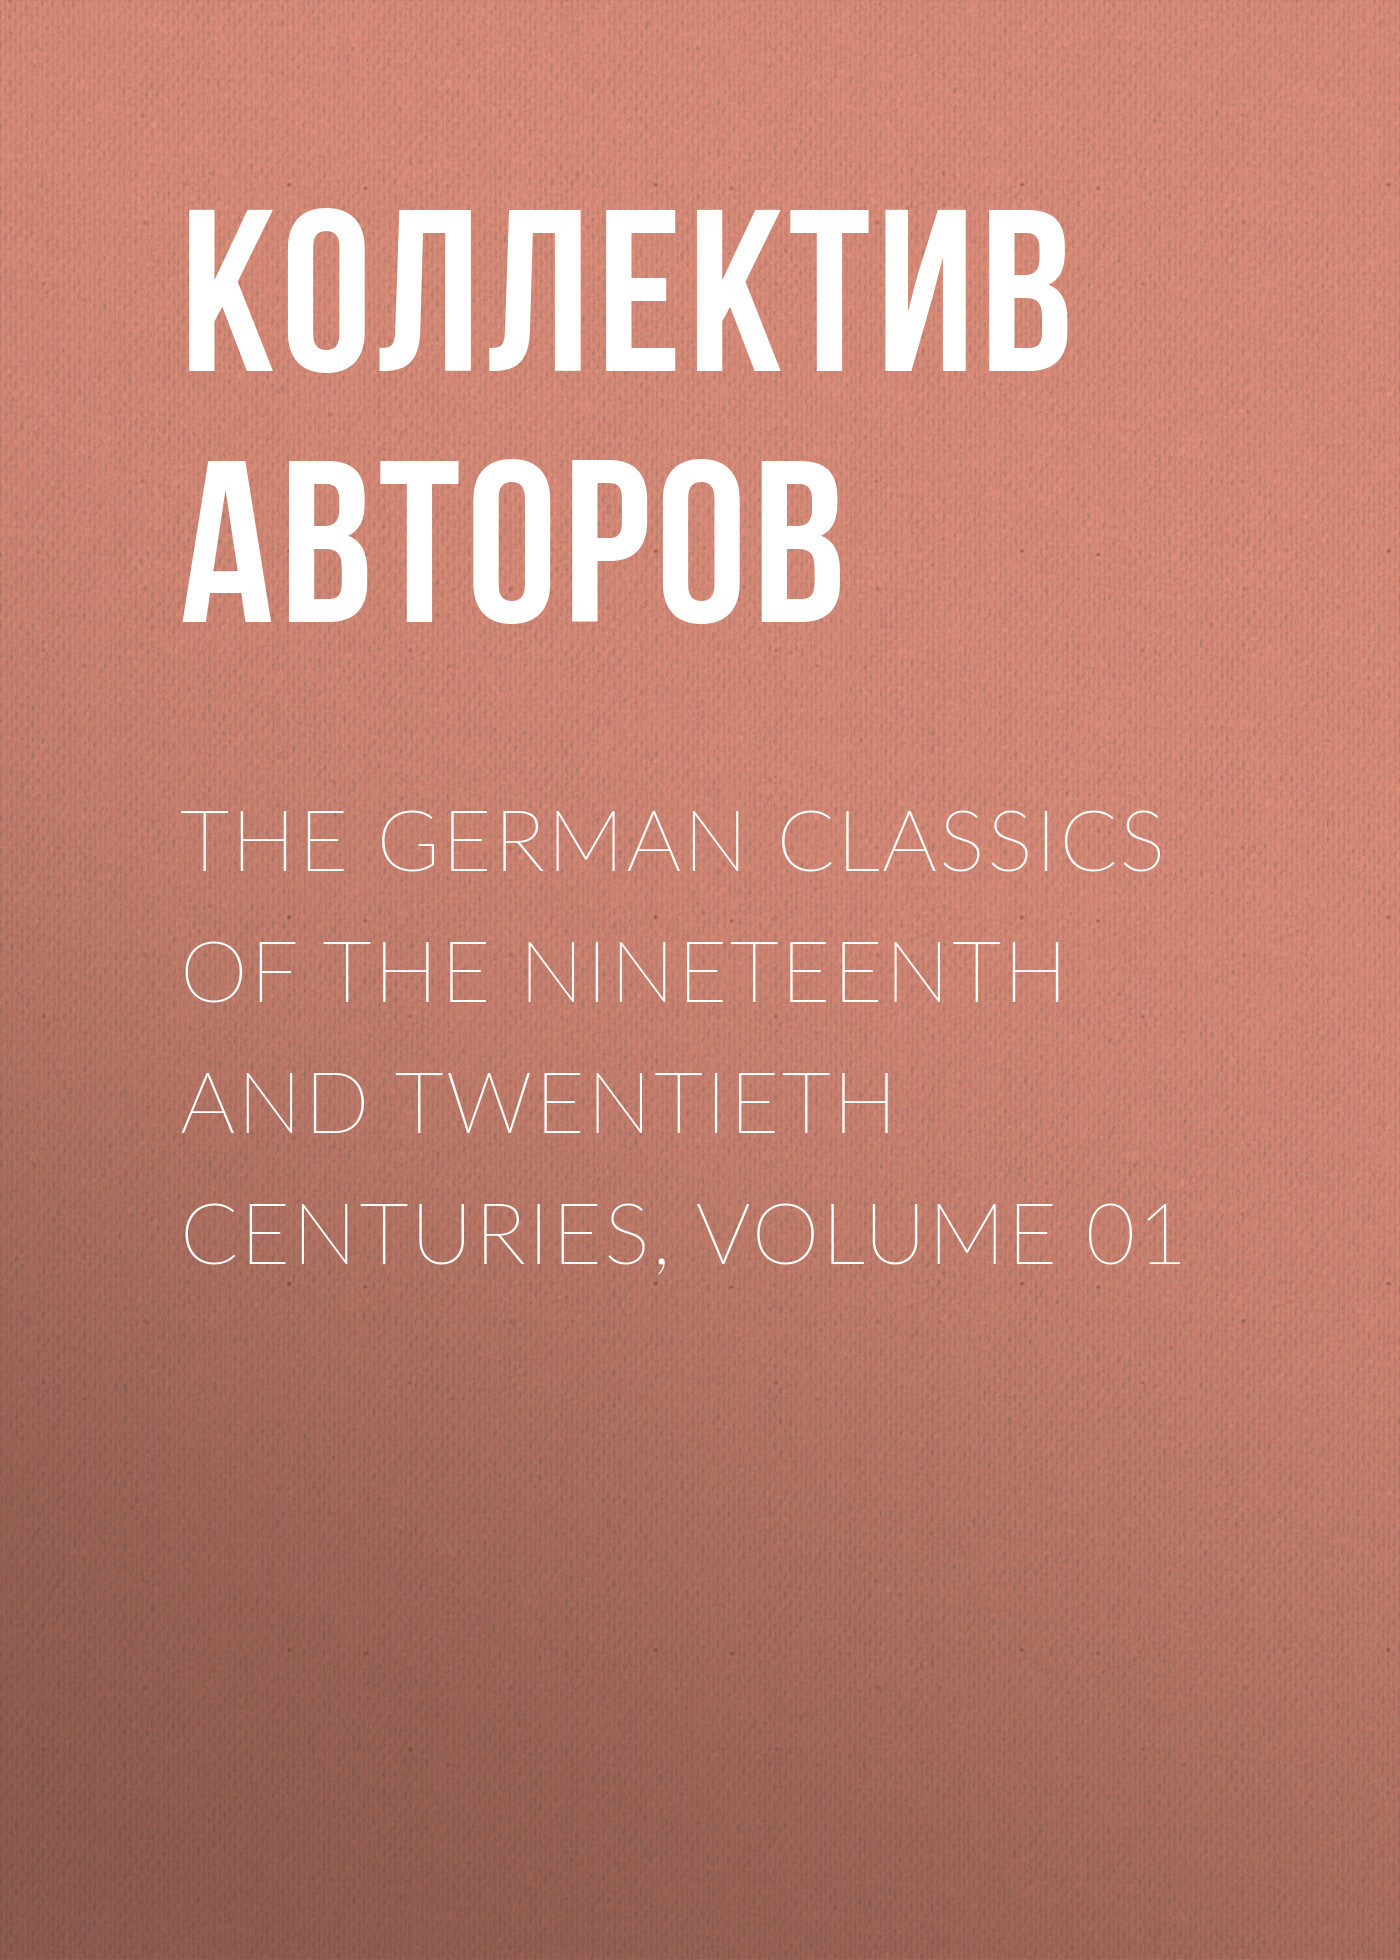 Коллектив авторов The German Classics of the Nineteenth and Twentieth Centuries, Volume 01 коллектив авторов 11 класс история